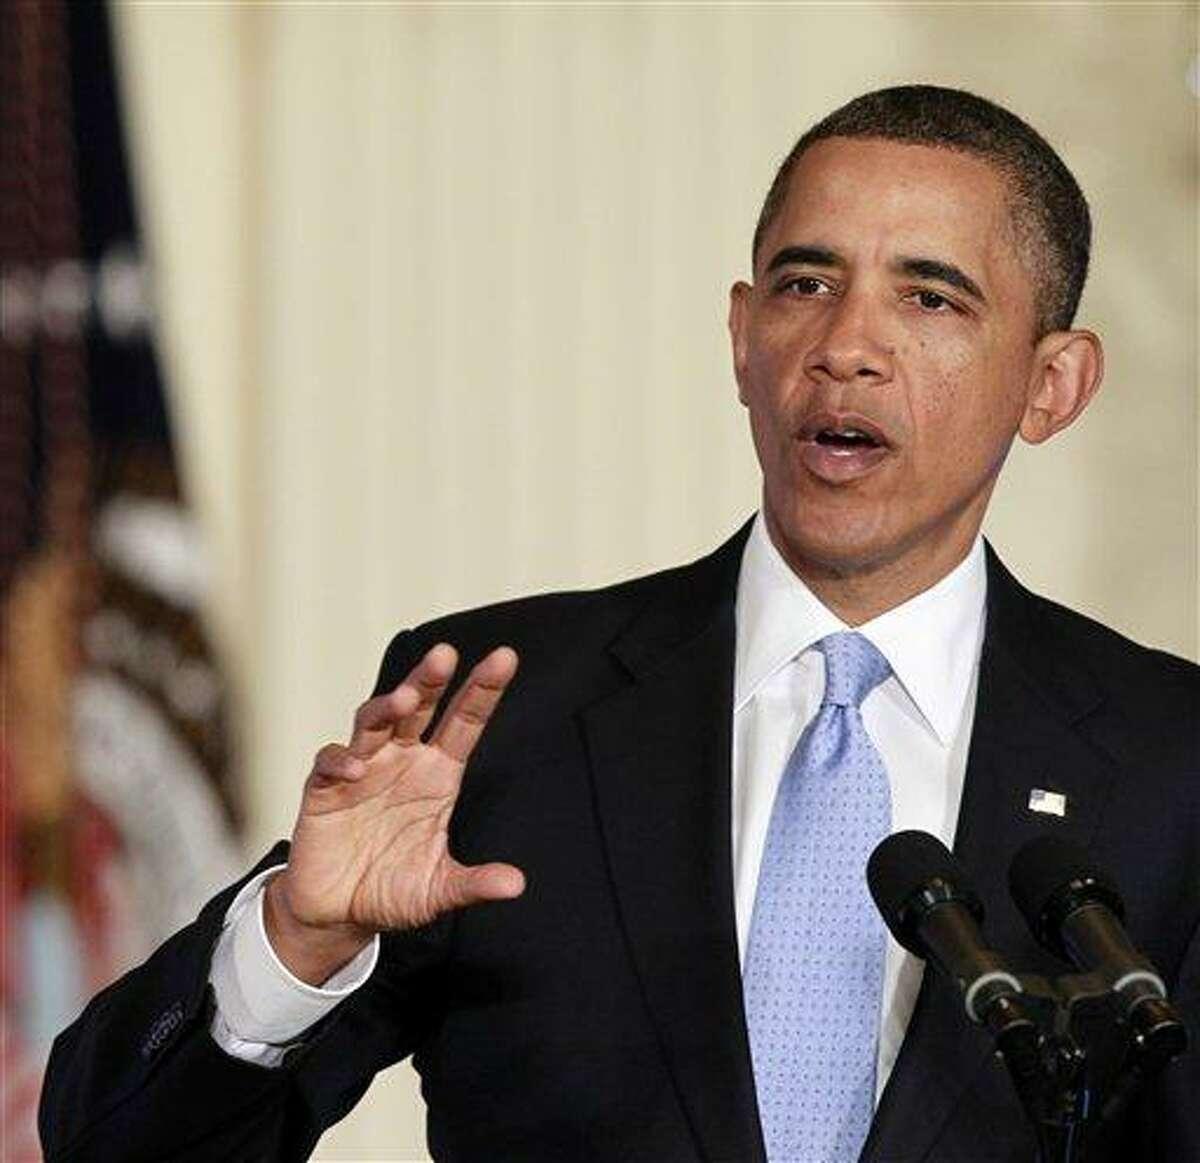 President Barack Obama speaks Jan. 13 in the East Room of the White House in Washington. Associated Press